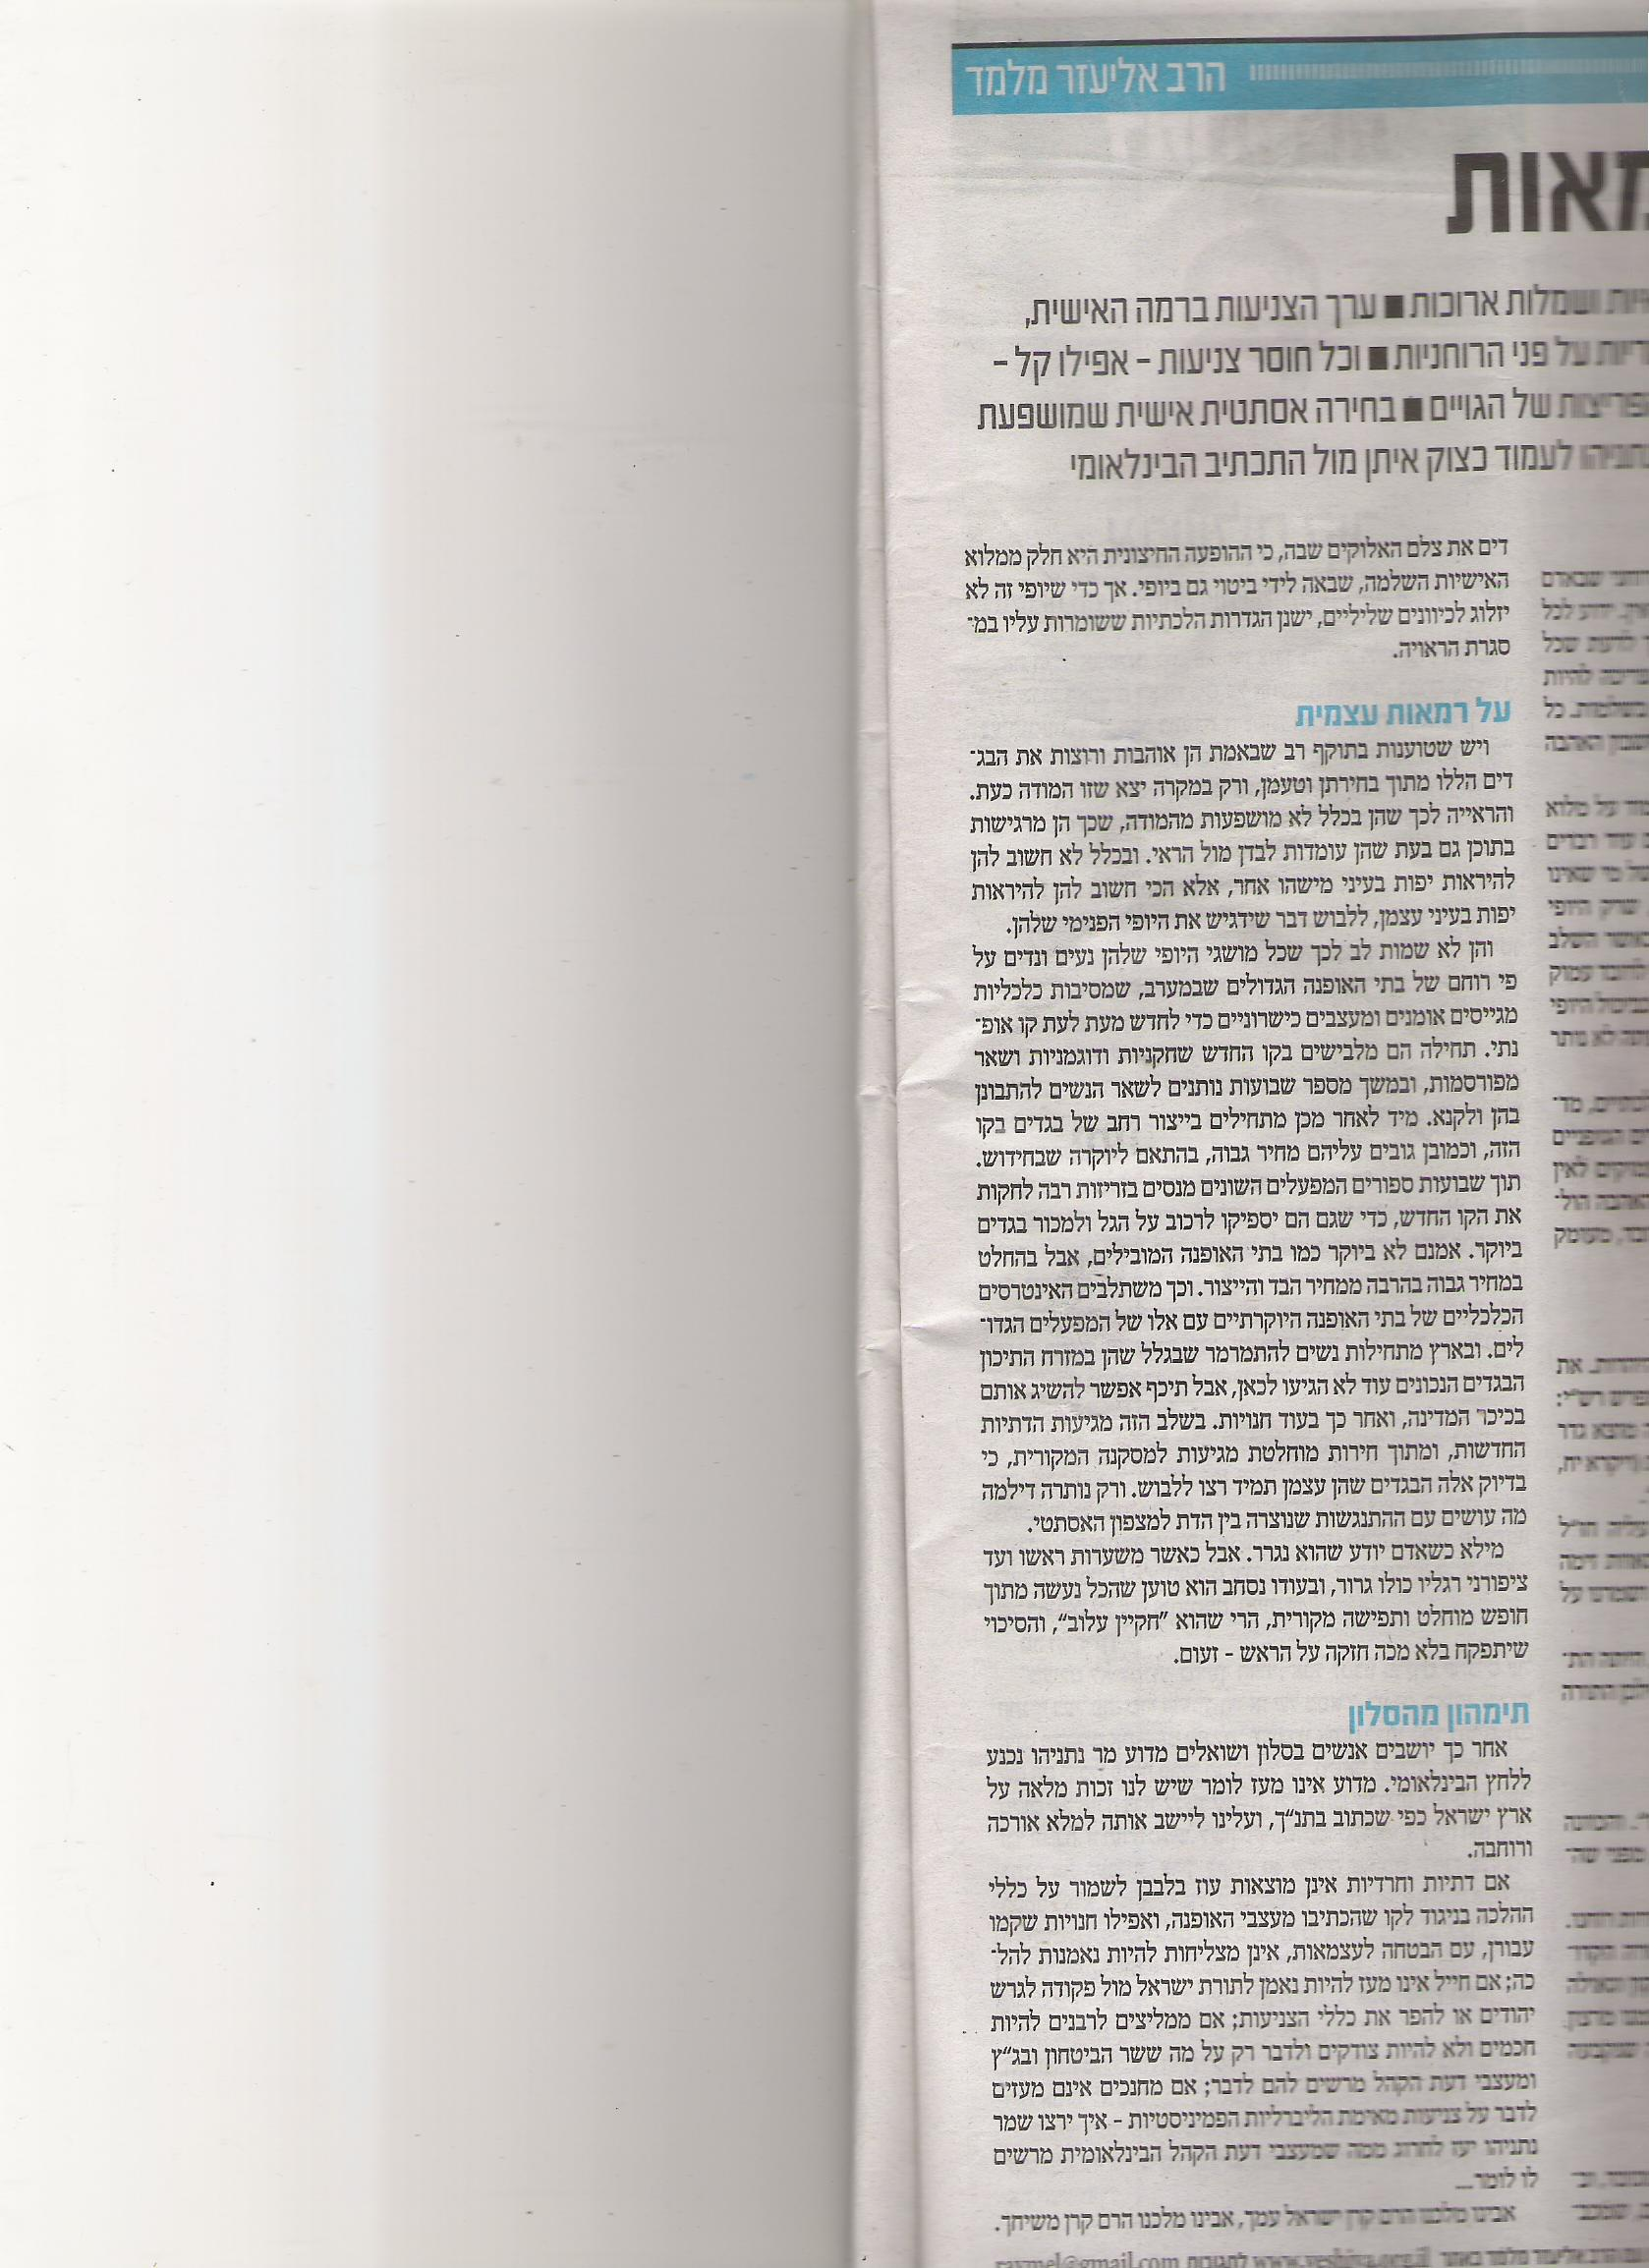 R. Melamed article from BeSheva on Tzniut, part II